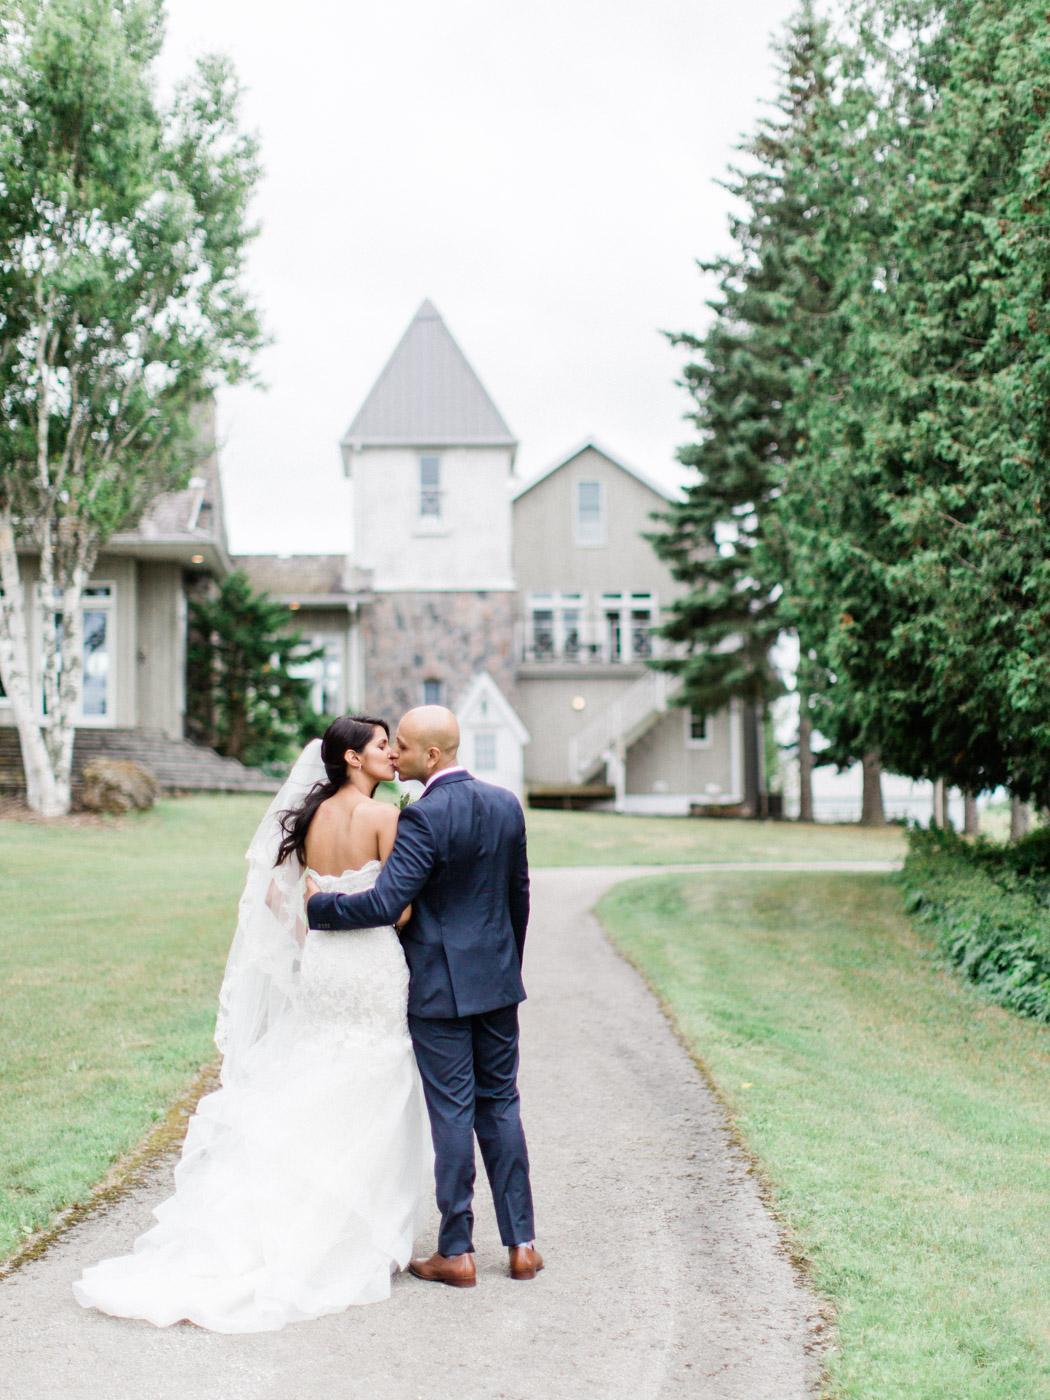 Toronto-Collingwood-wedding-photographer-indian-wedding-documentary75.jpg